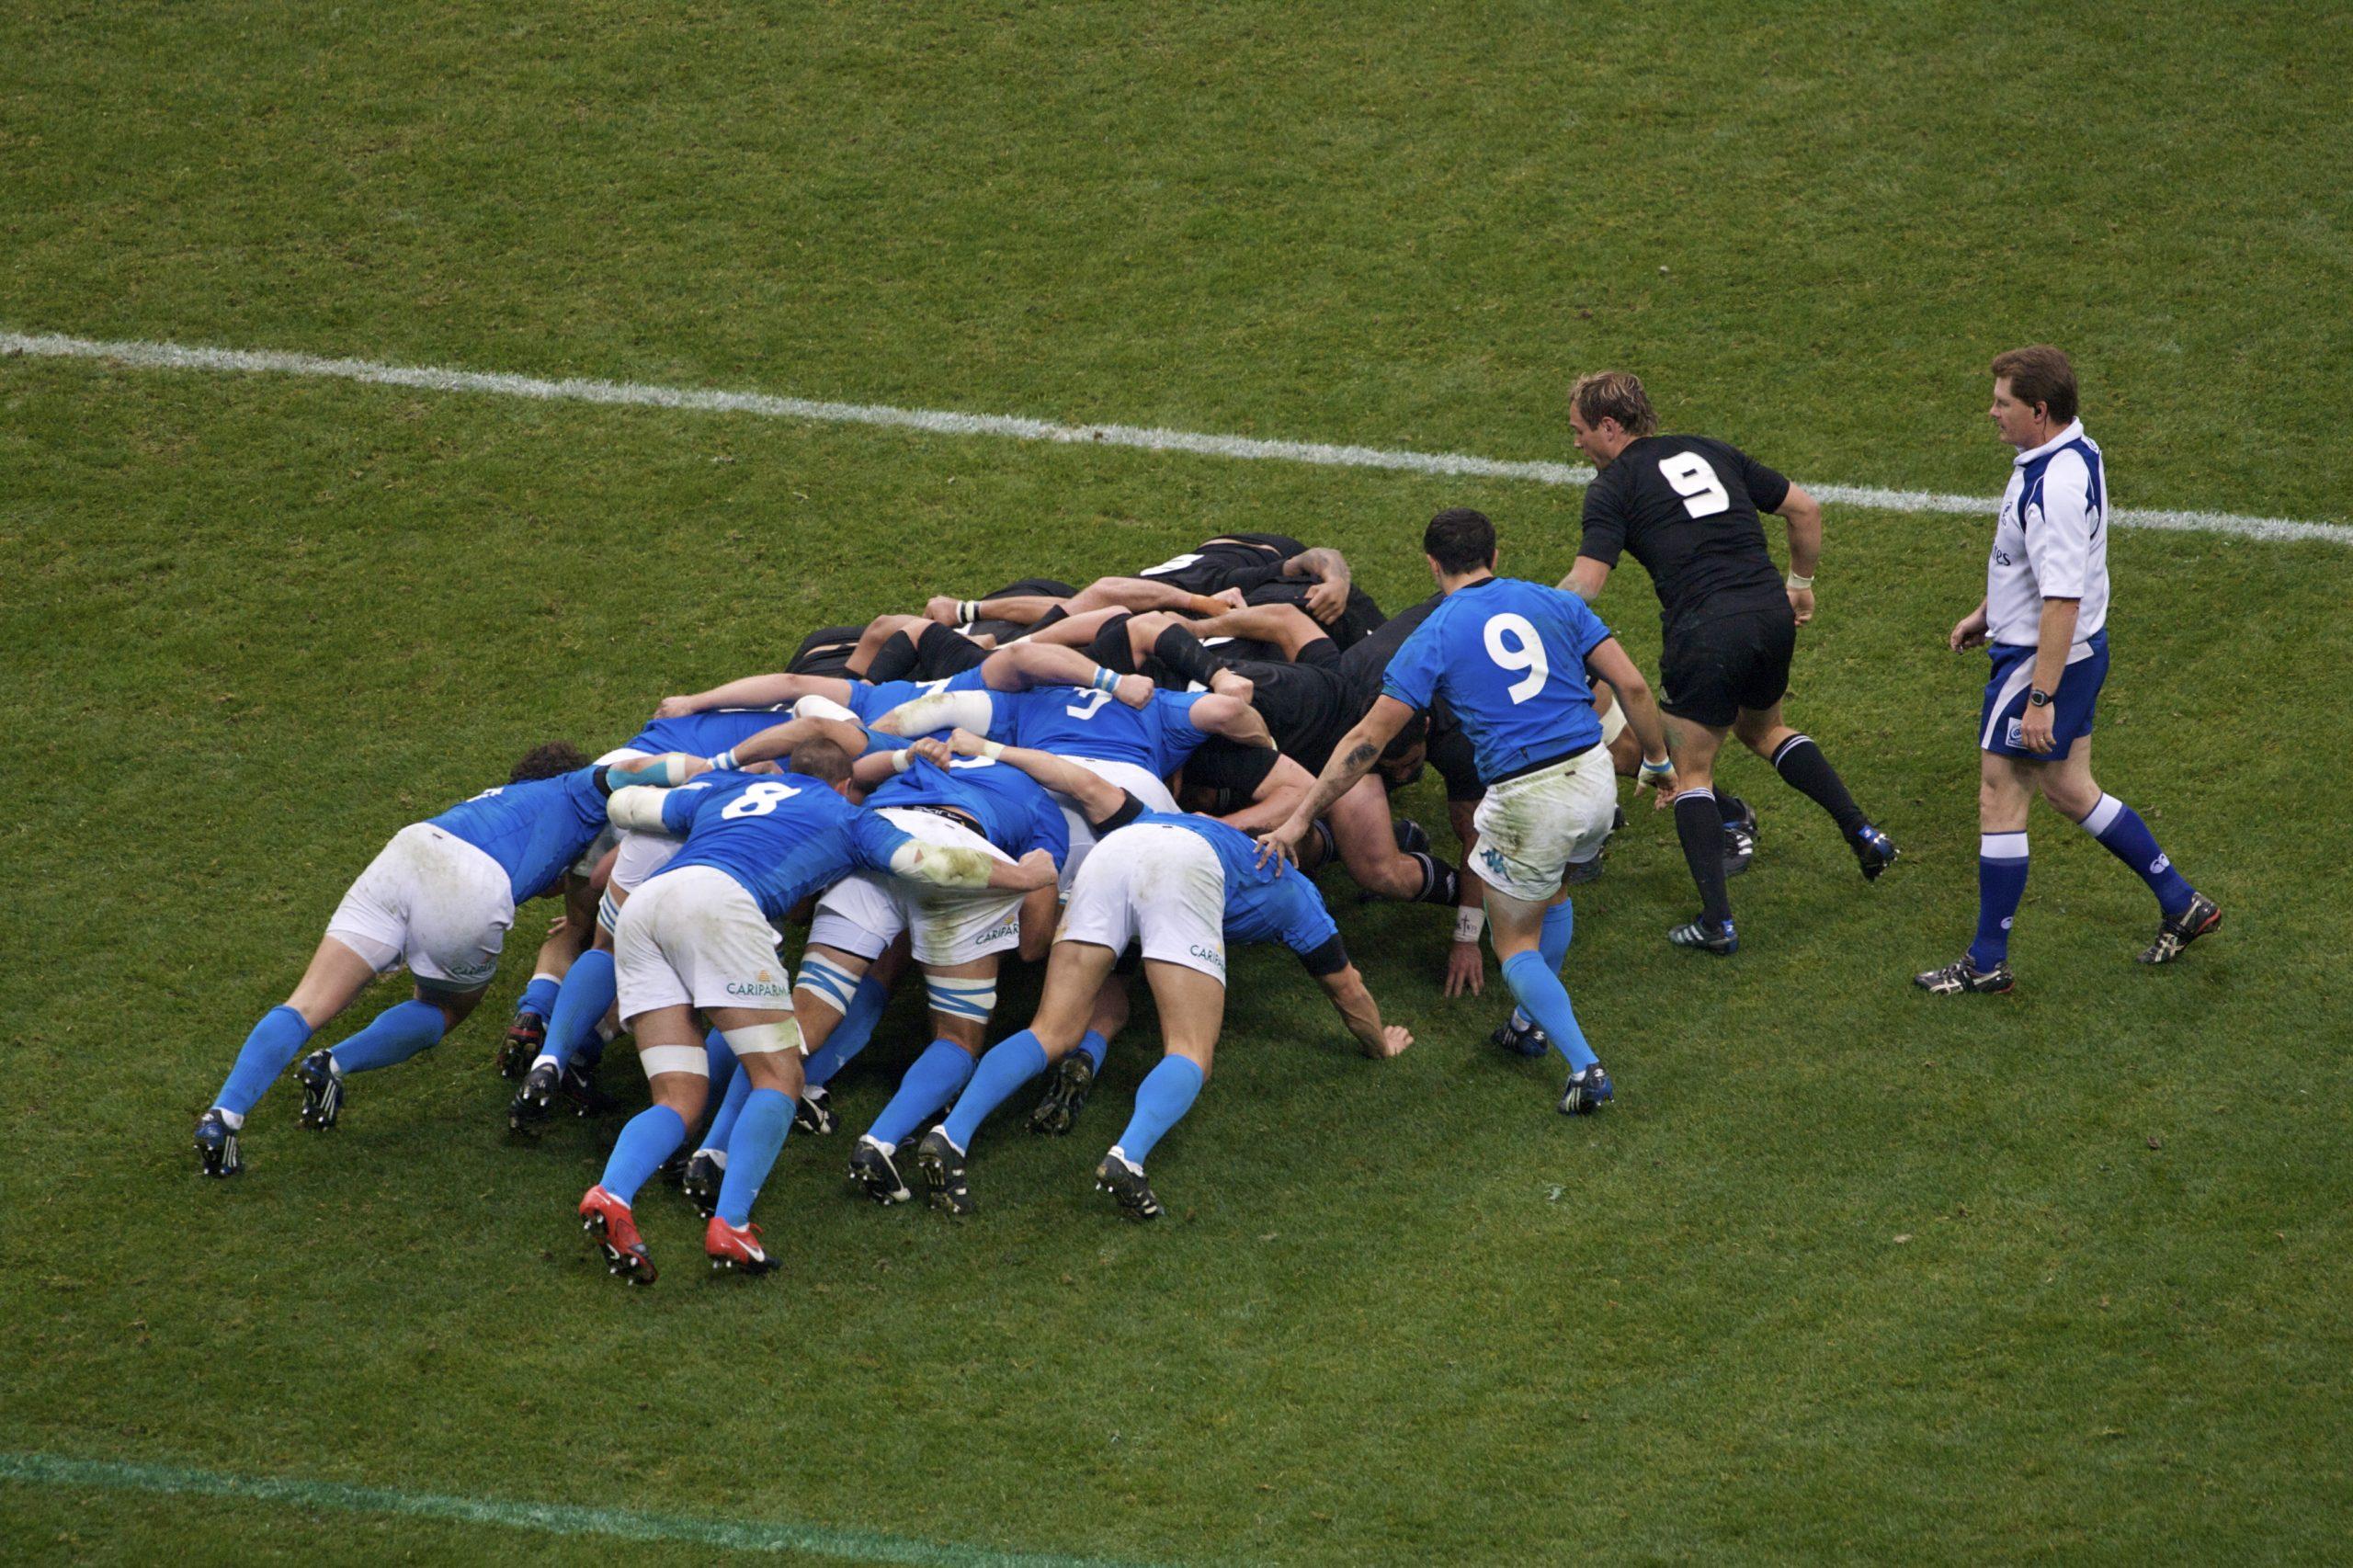 meilleures équipes en rugby